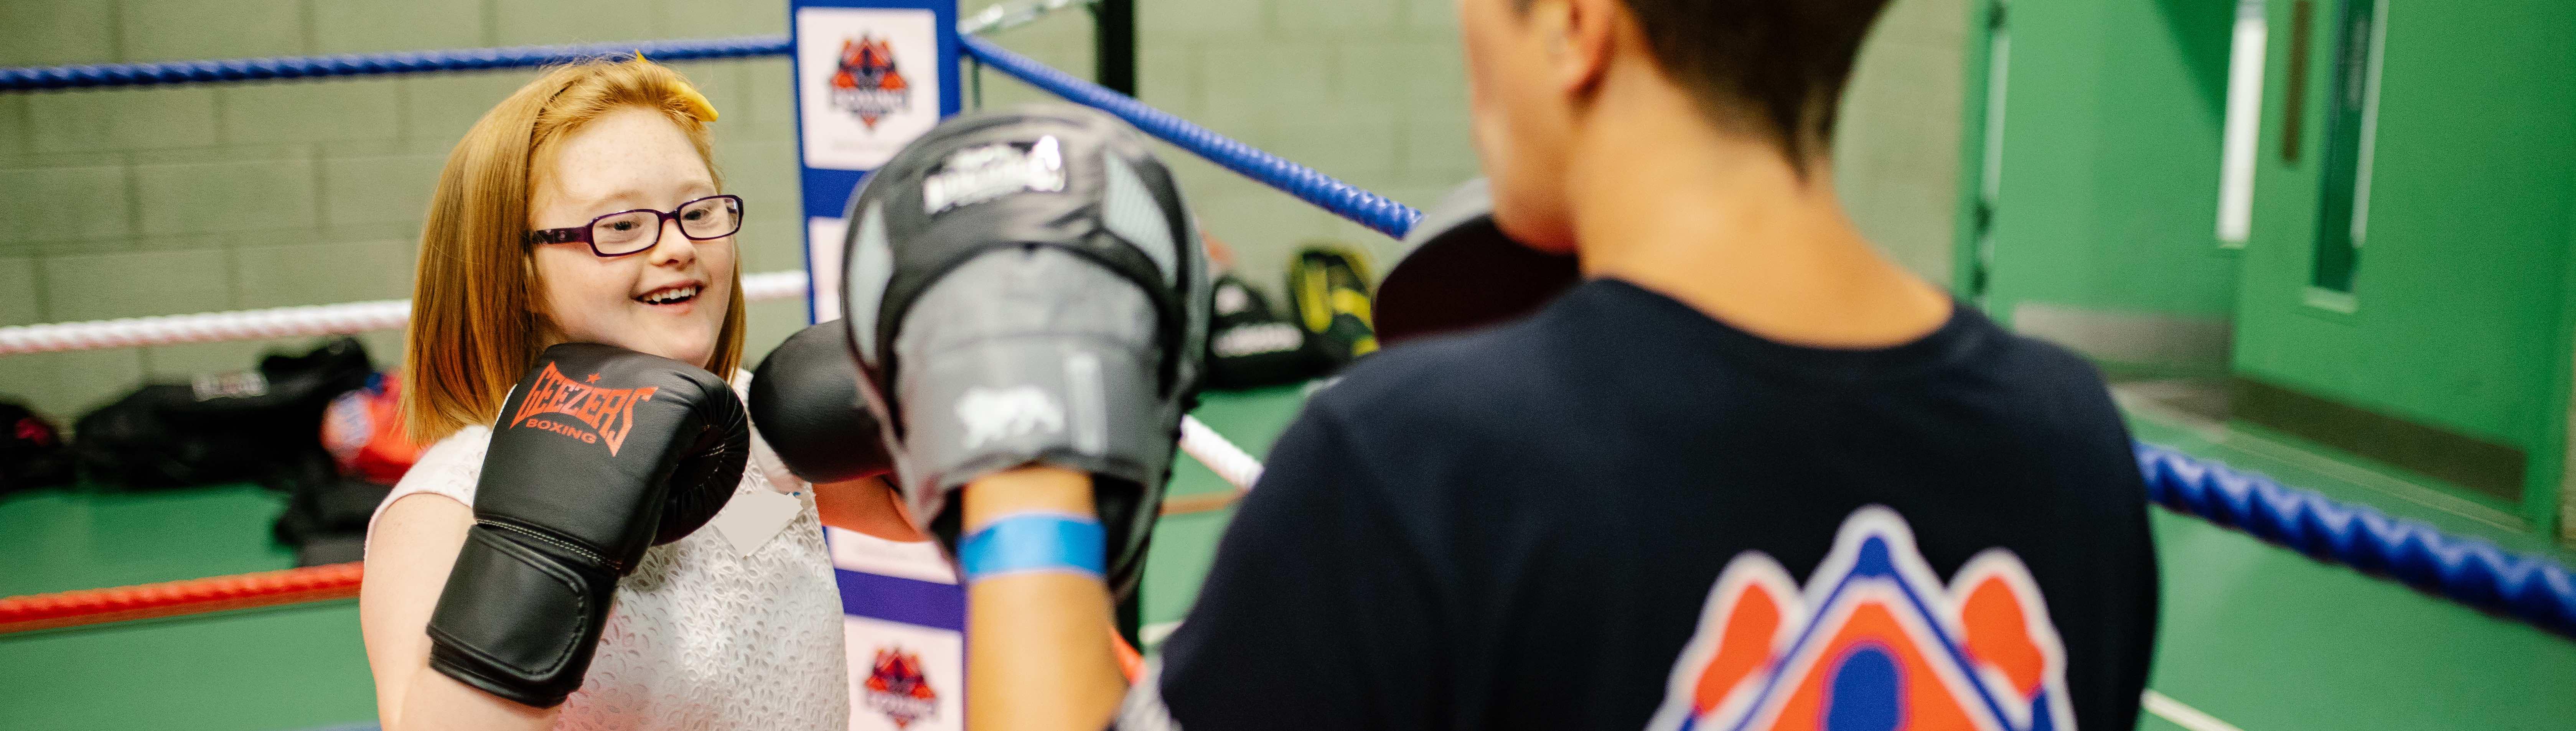 sports photo - boxing